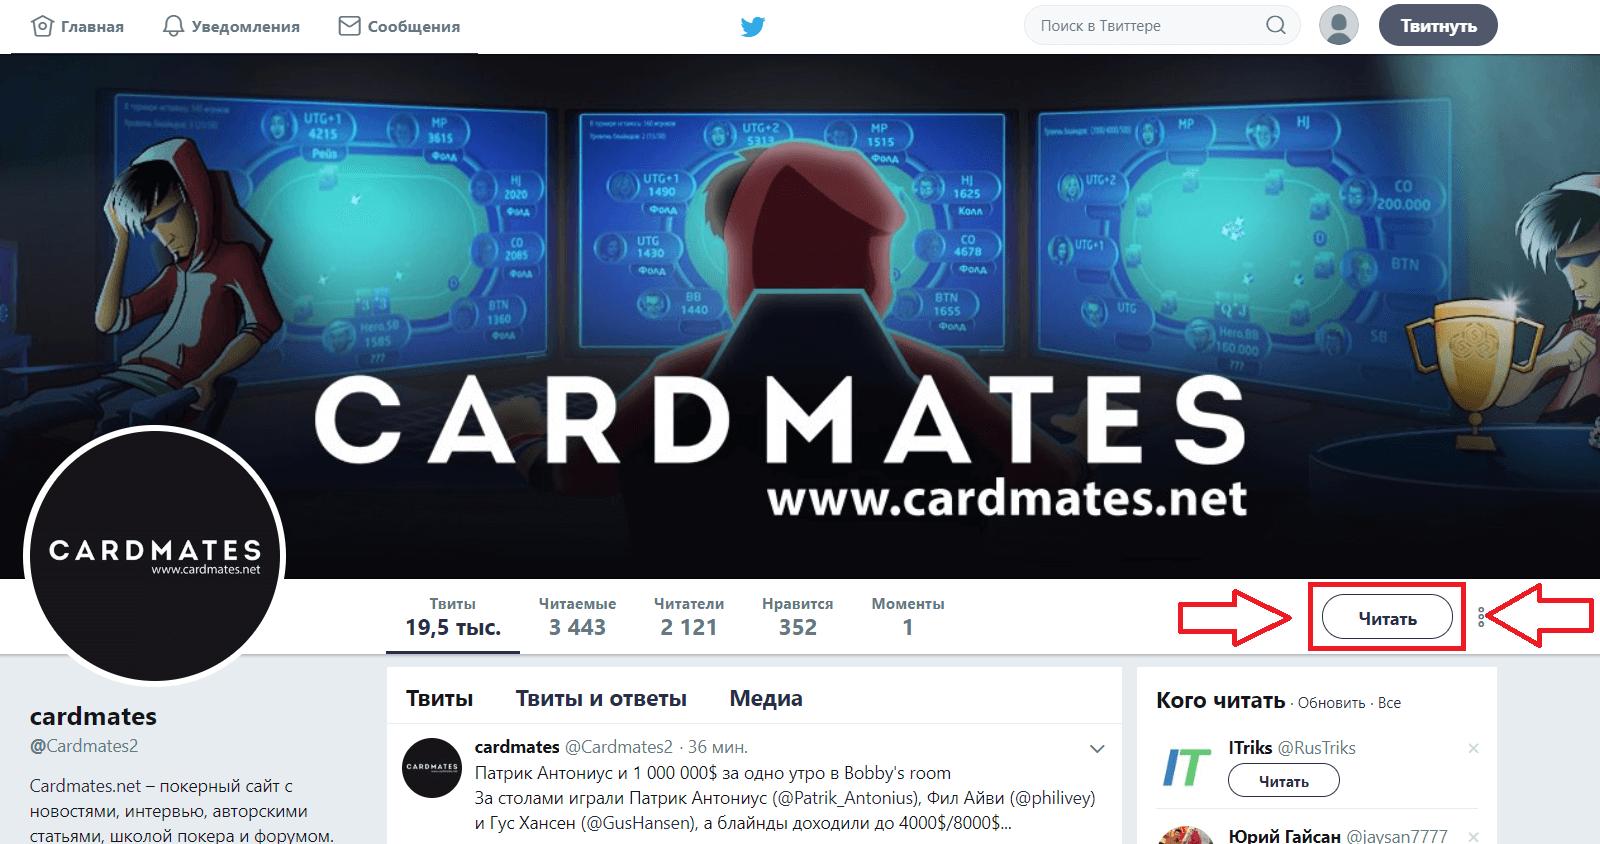 Cardmates в Twitter